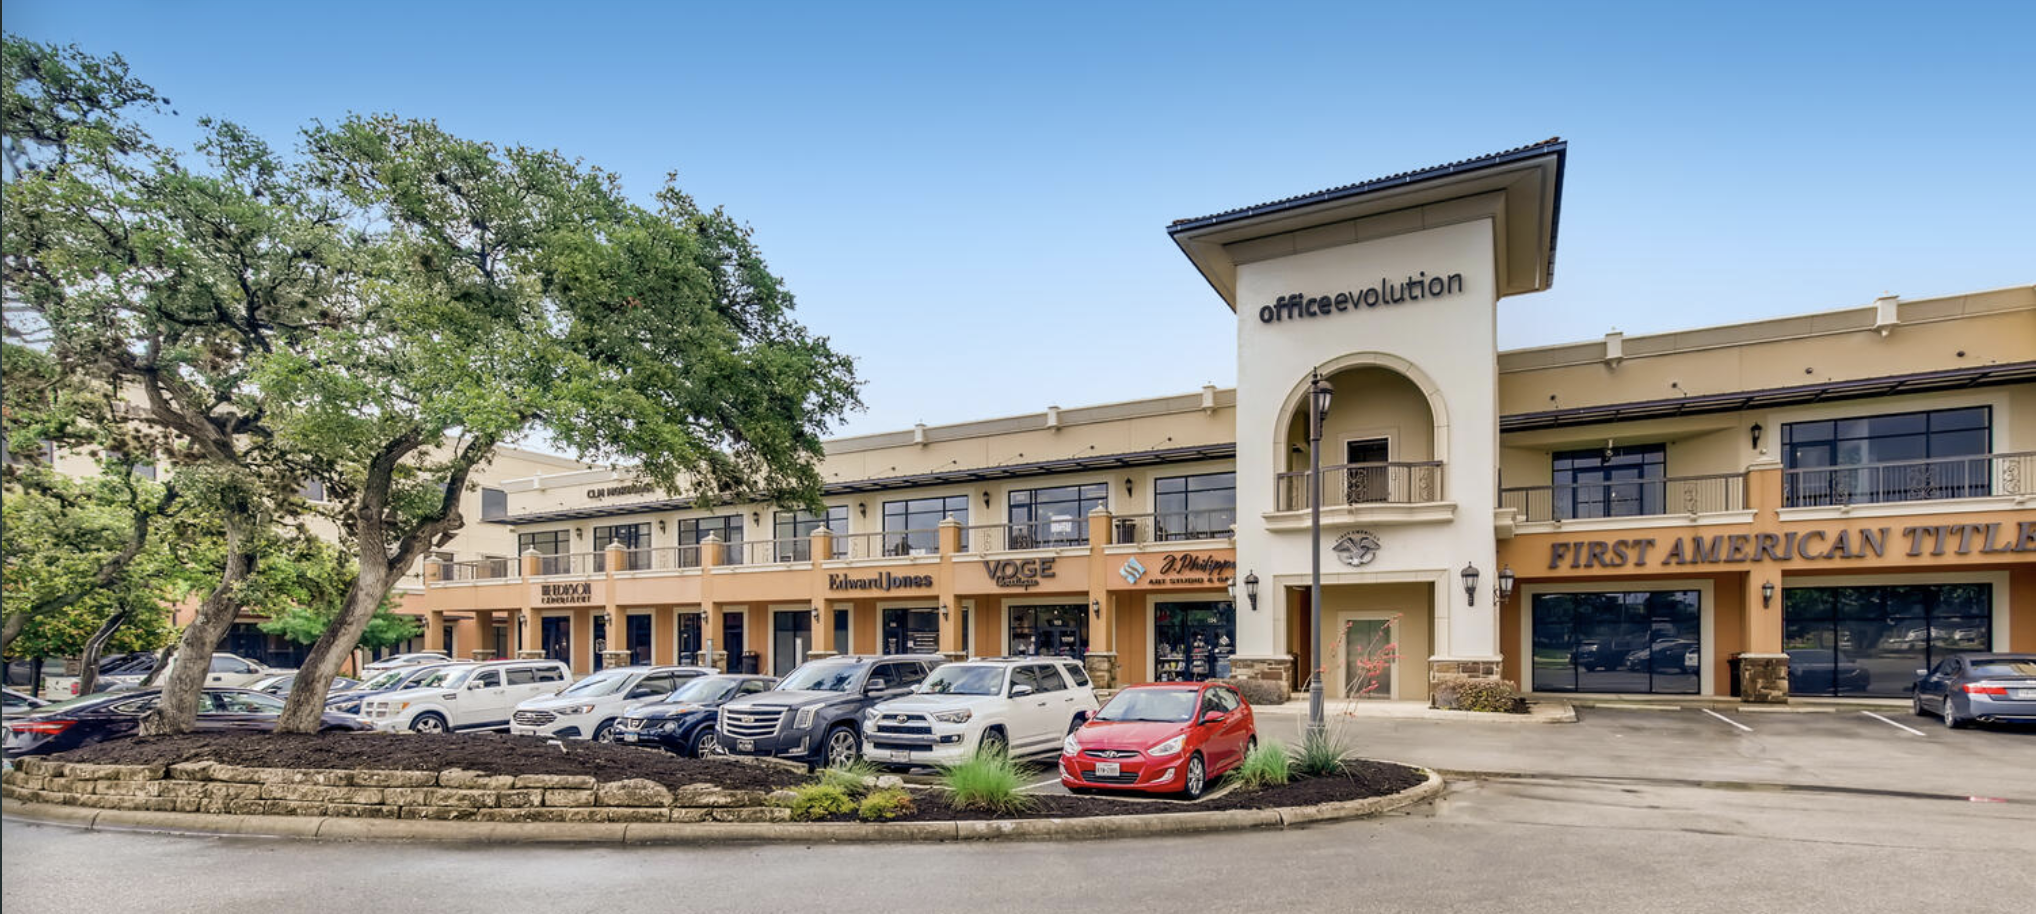 Office Evolution - San Antonio Sonterra, TX reviews | Shared Office Spaces at 1846 N Loop 1604 W - San Antonio TX